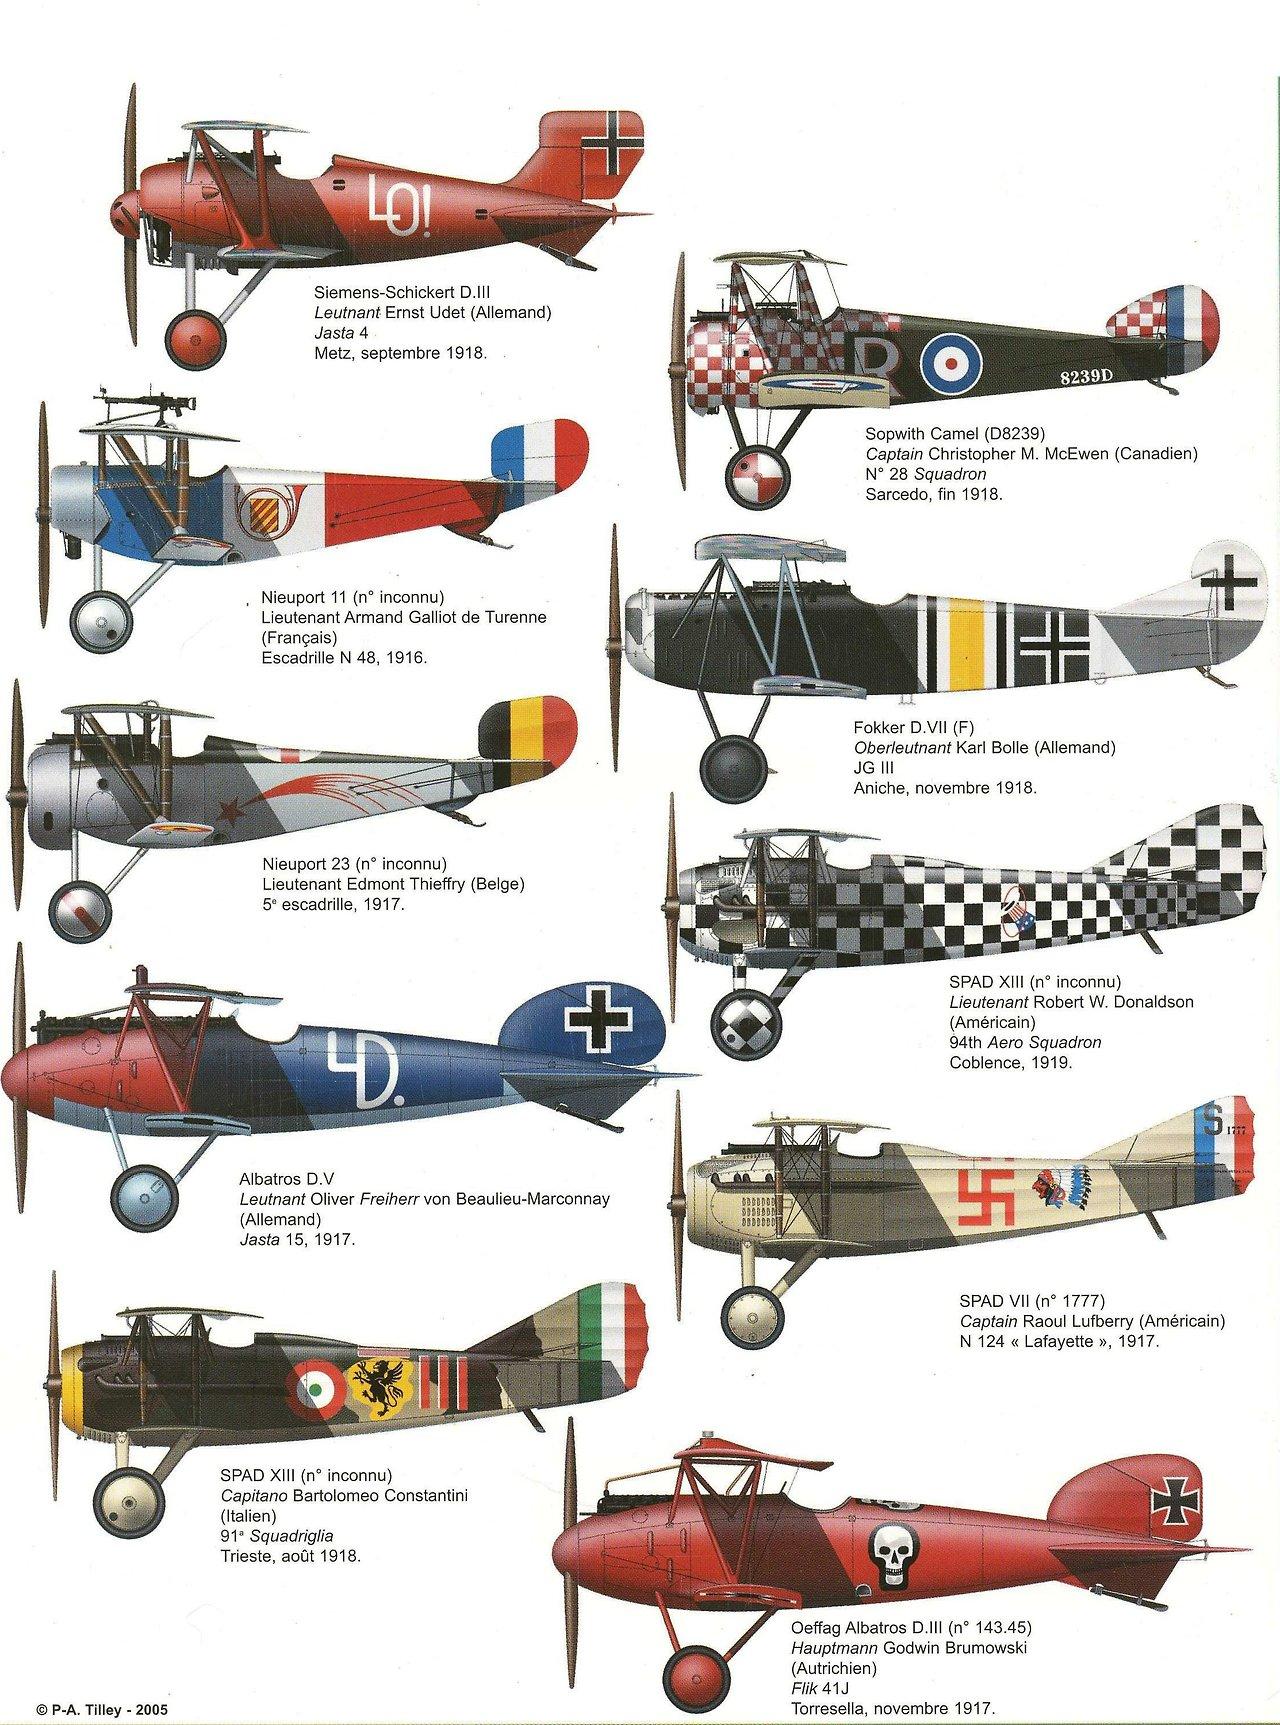 Drawn airplane world war 1 aircraft #14